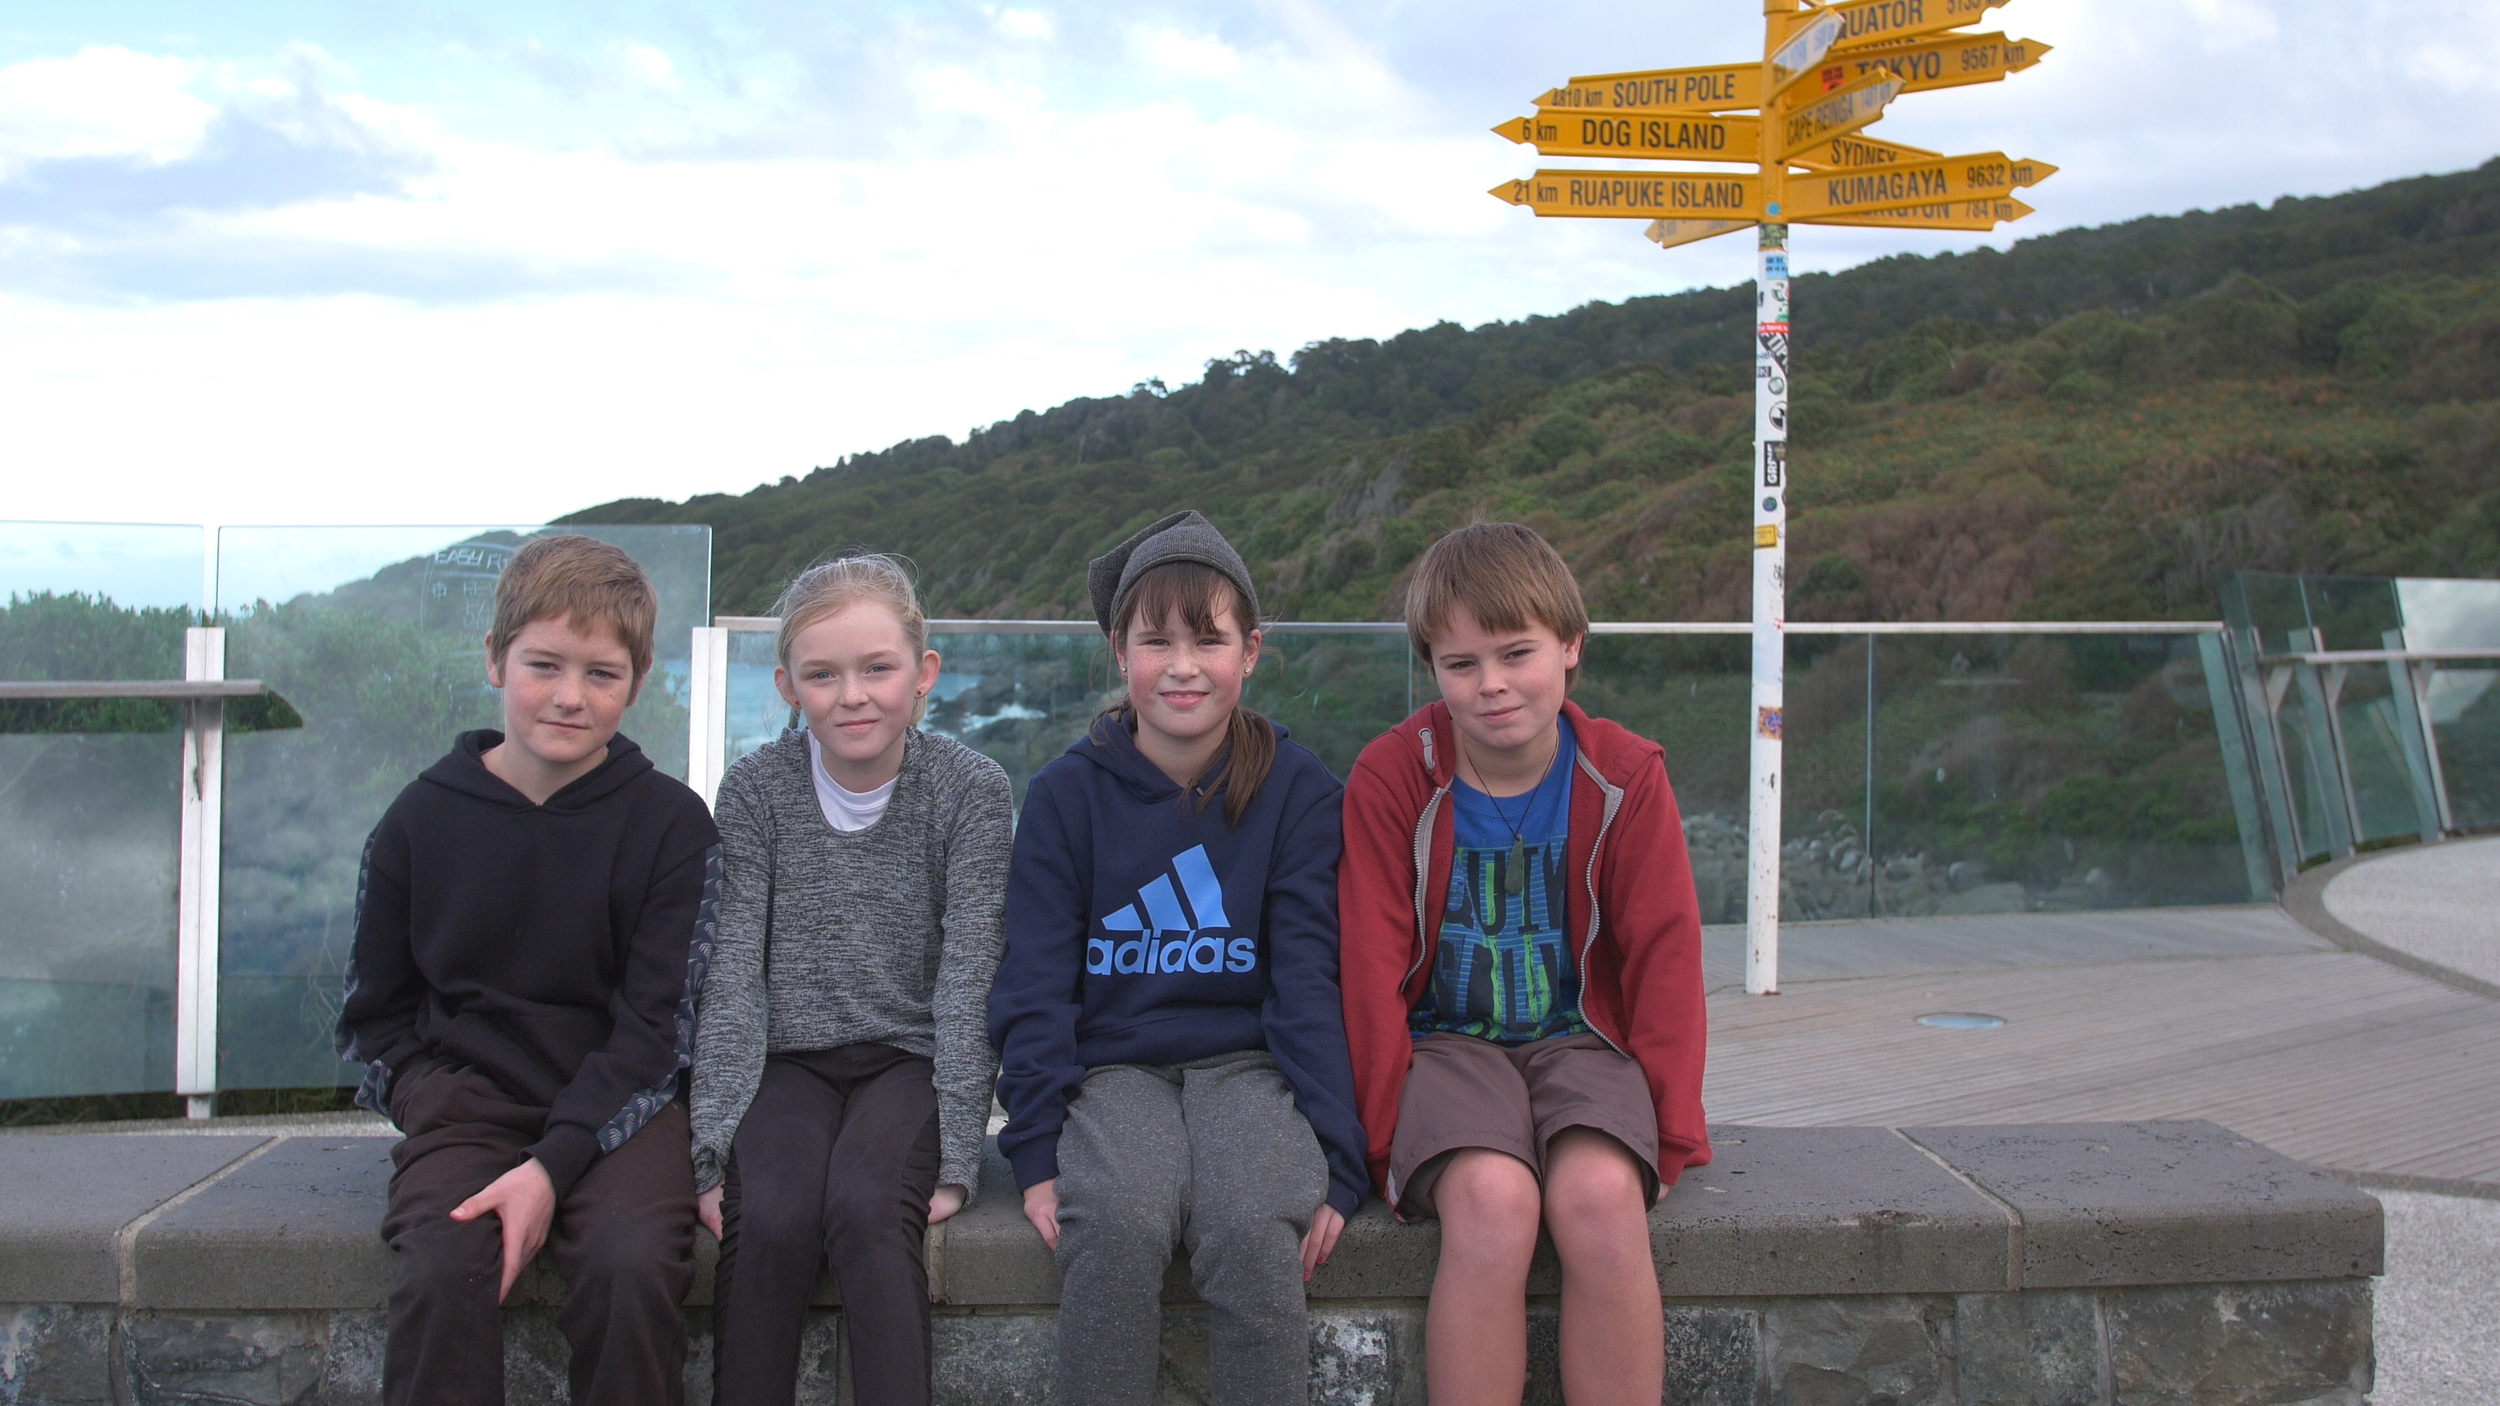 Children in Invercargill